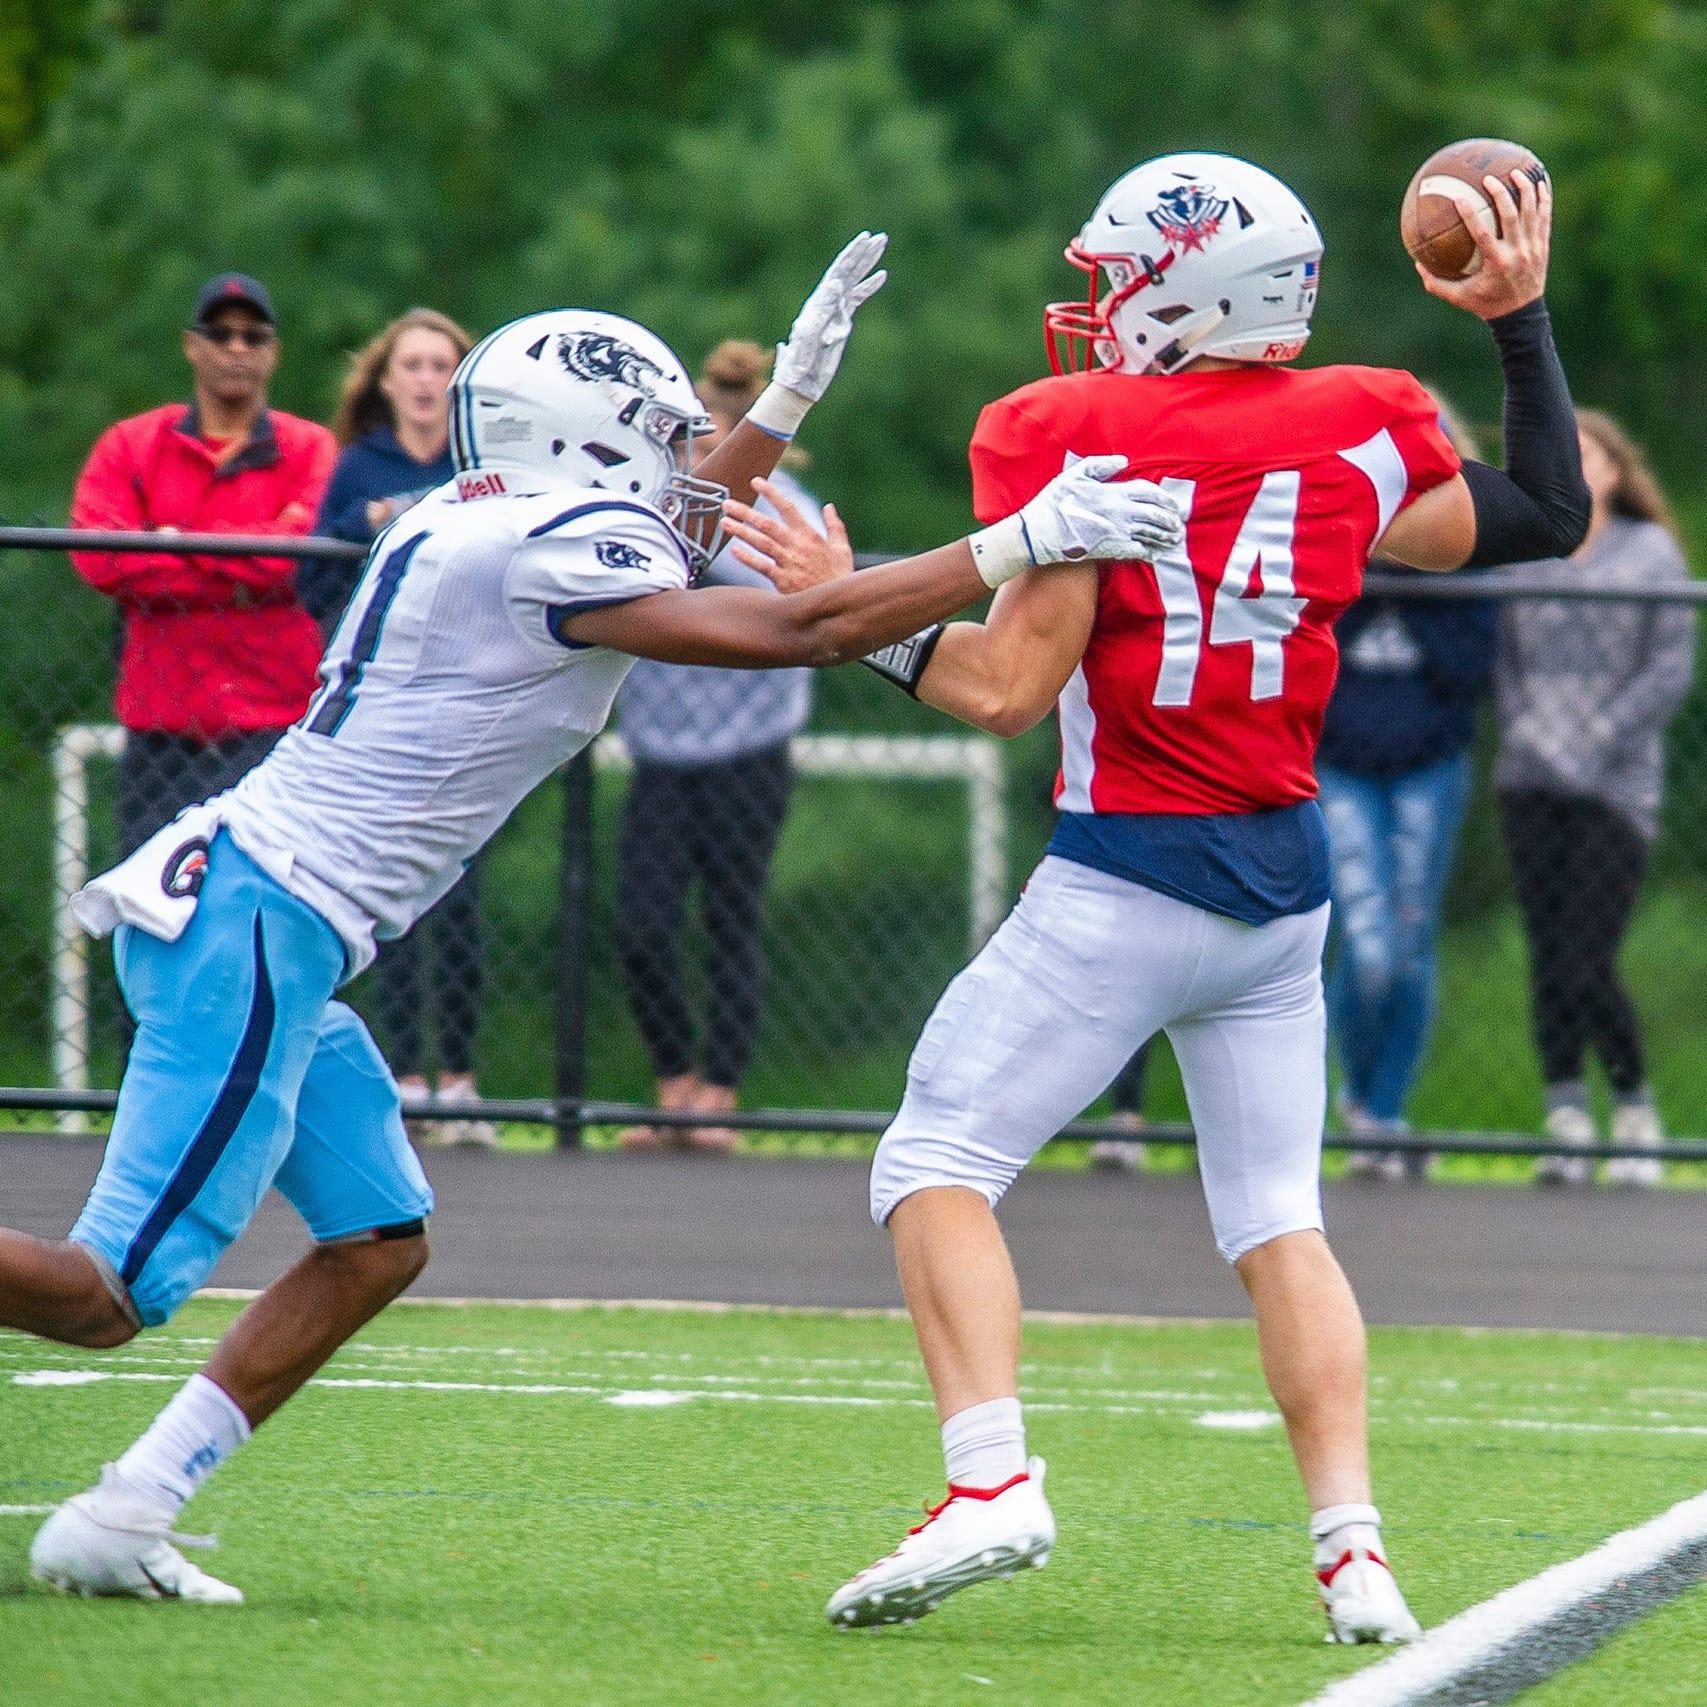 Mendham quarterback Gage Armijo growing into new role